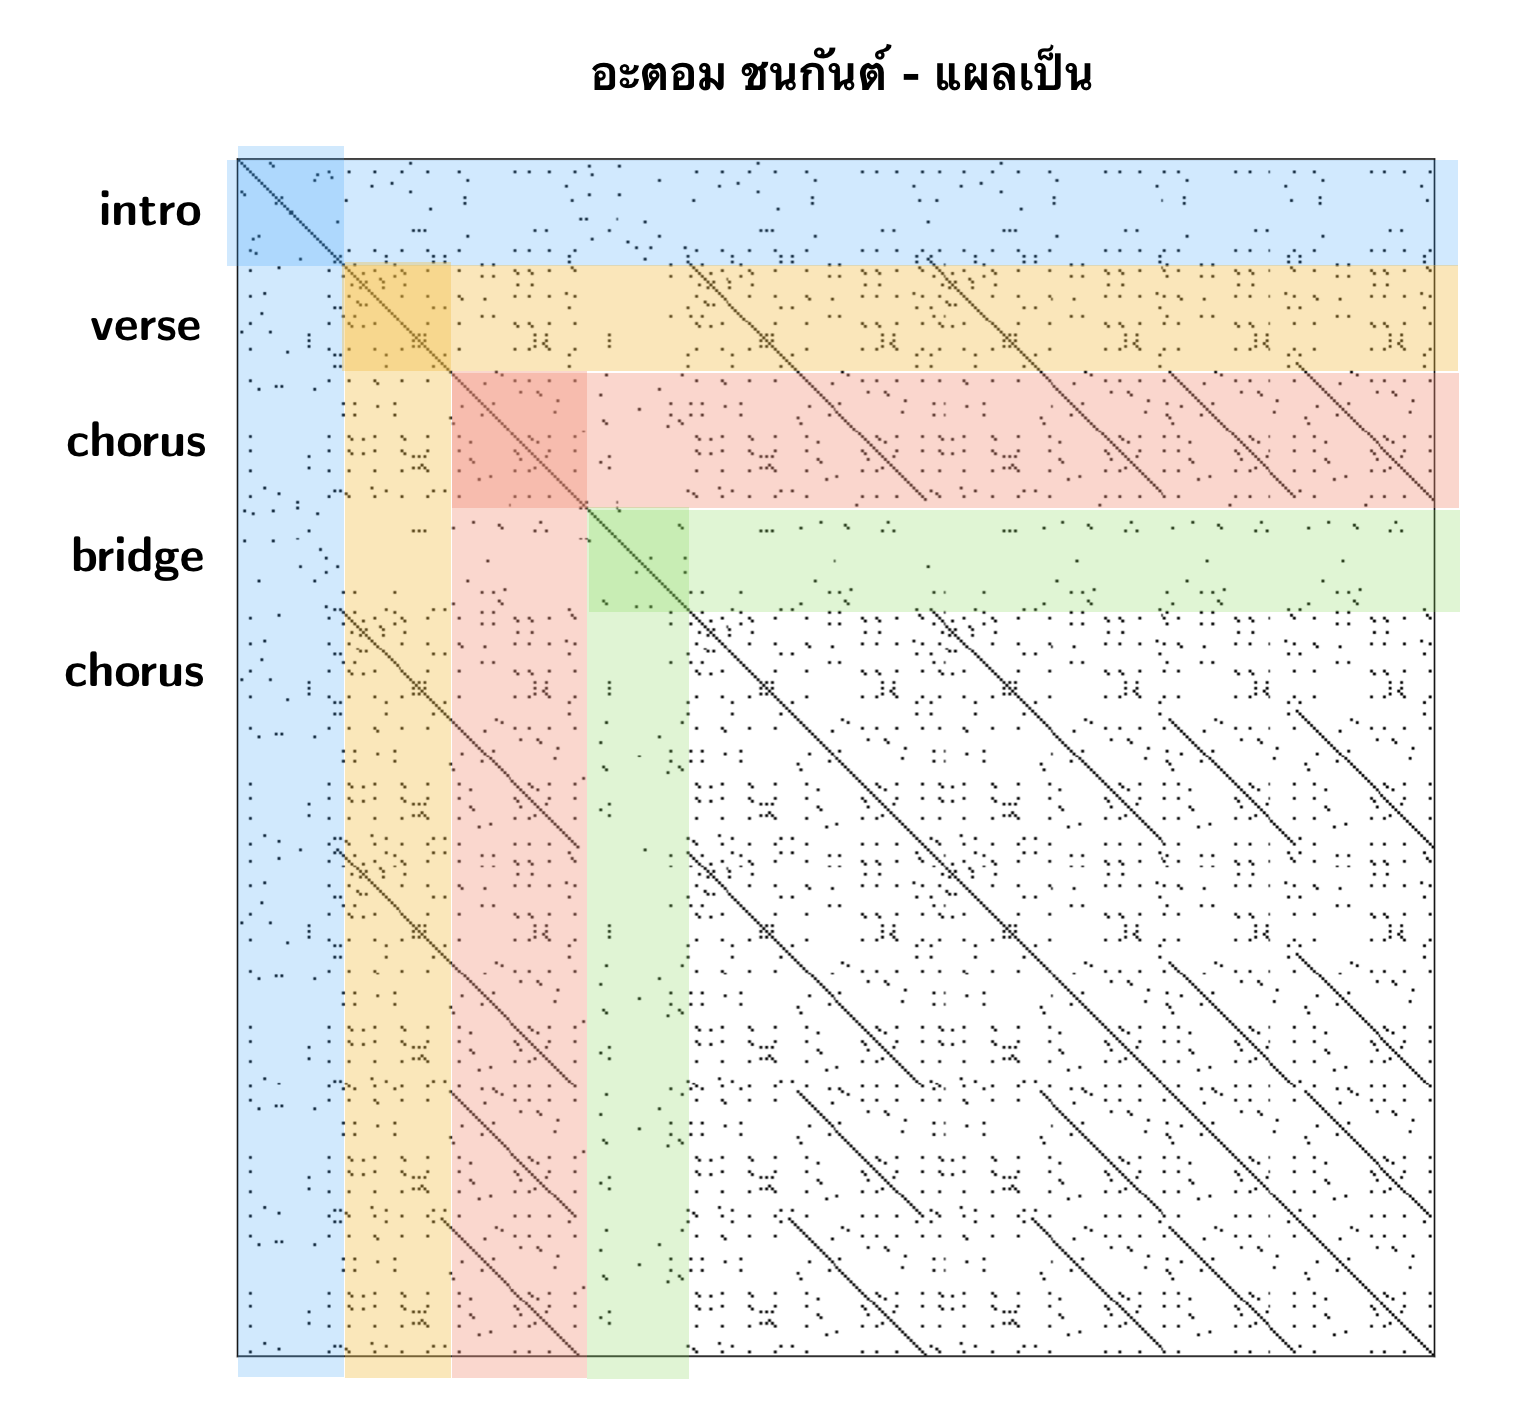 Analysis of Thai pop songs' lyrics